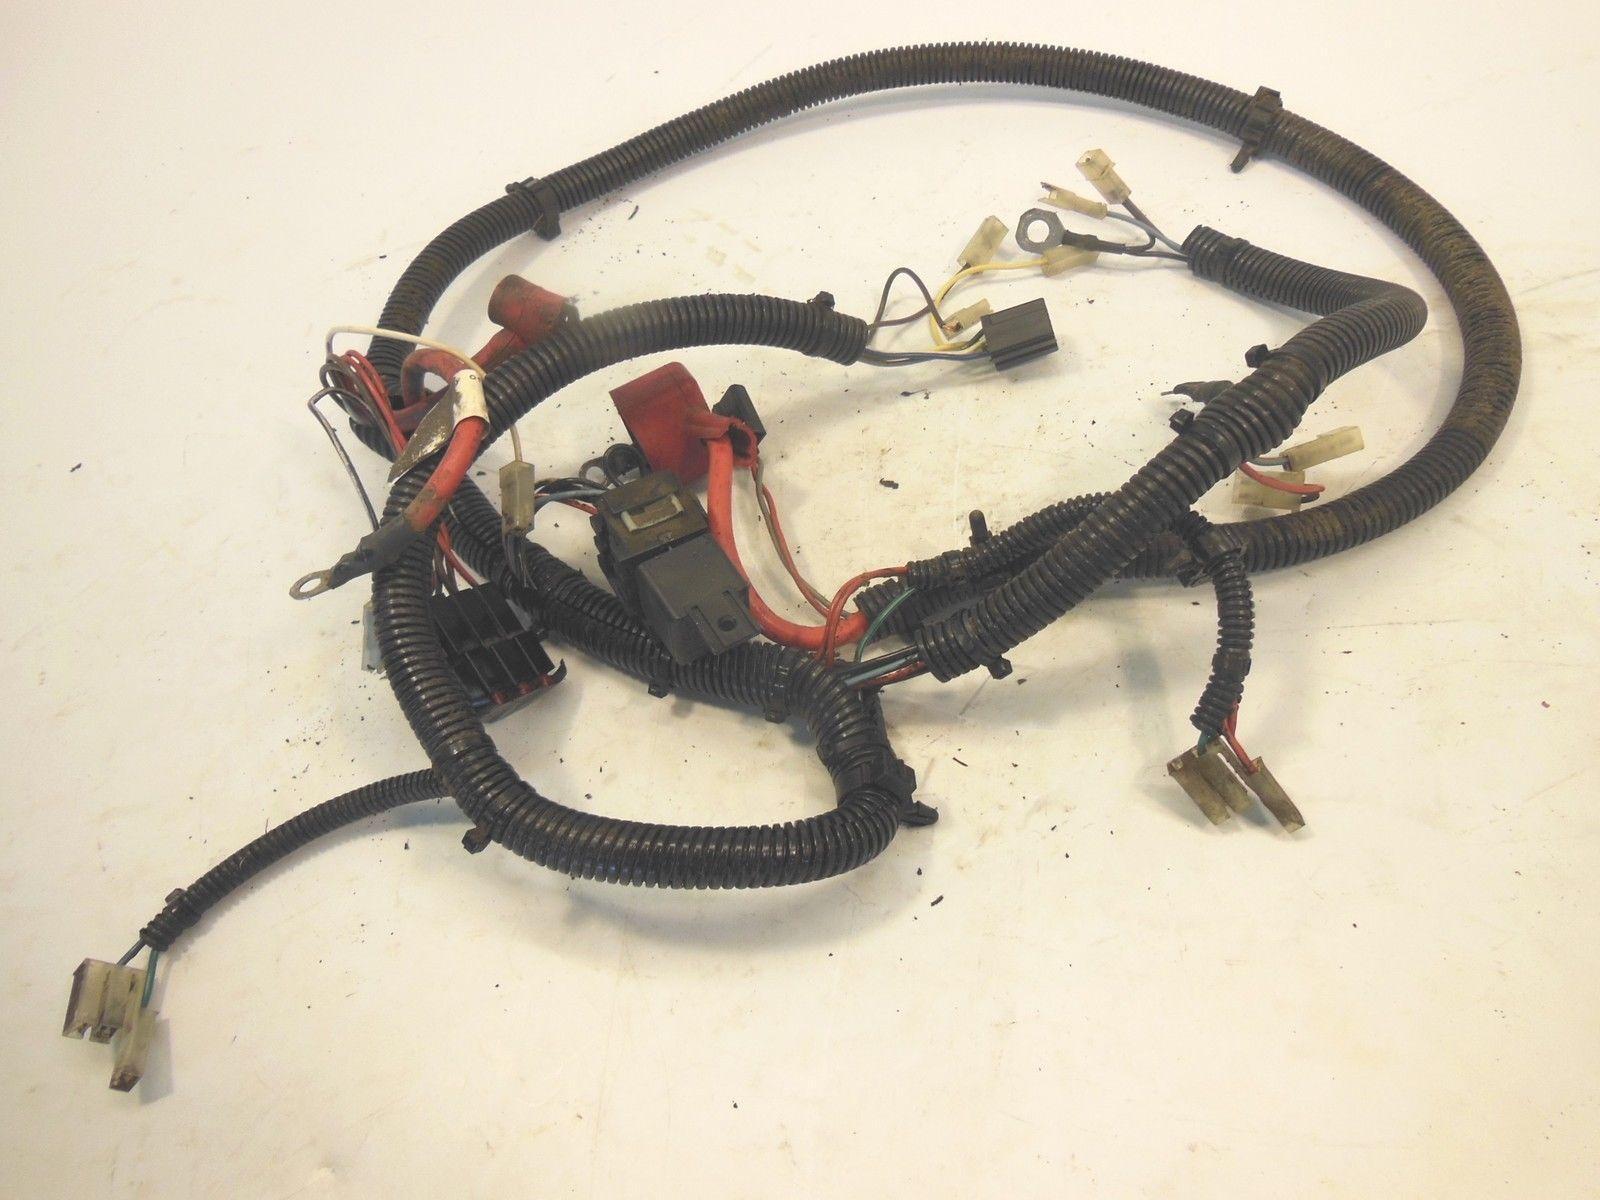 toro 14-38 hxl wheel horse 71215 main electrical wiring ... wheel horse wiring harness #9